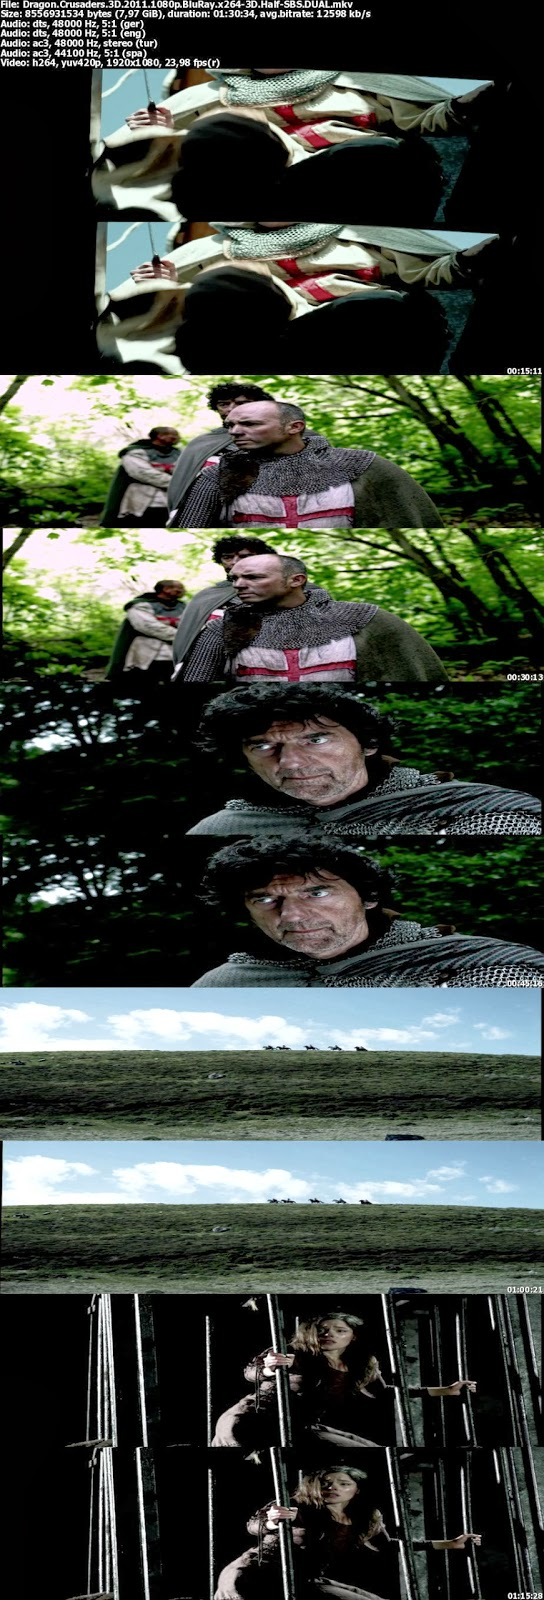 Dragon Savaşçıları 3D 2011 BluRay 1080p Türkçe Dublaj Film İndir